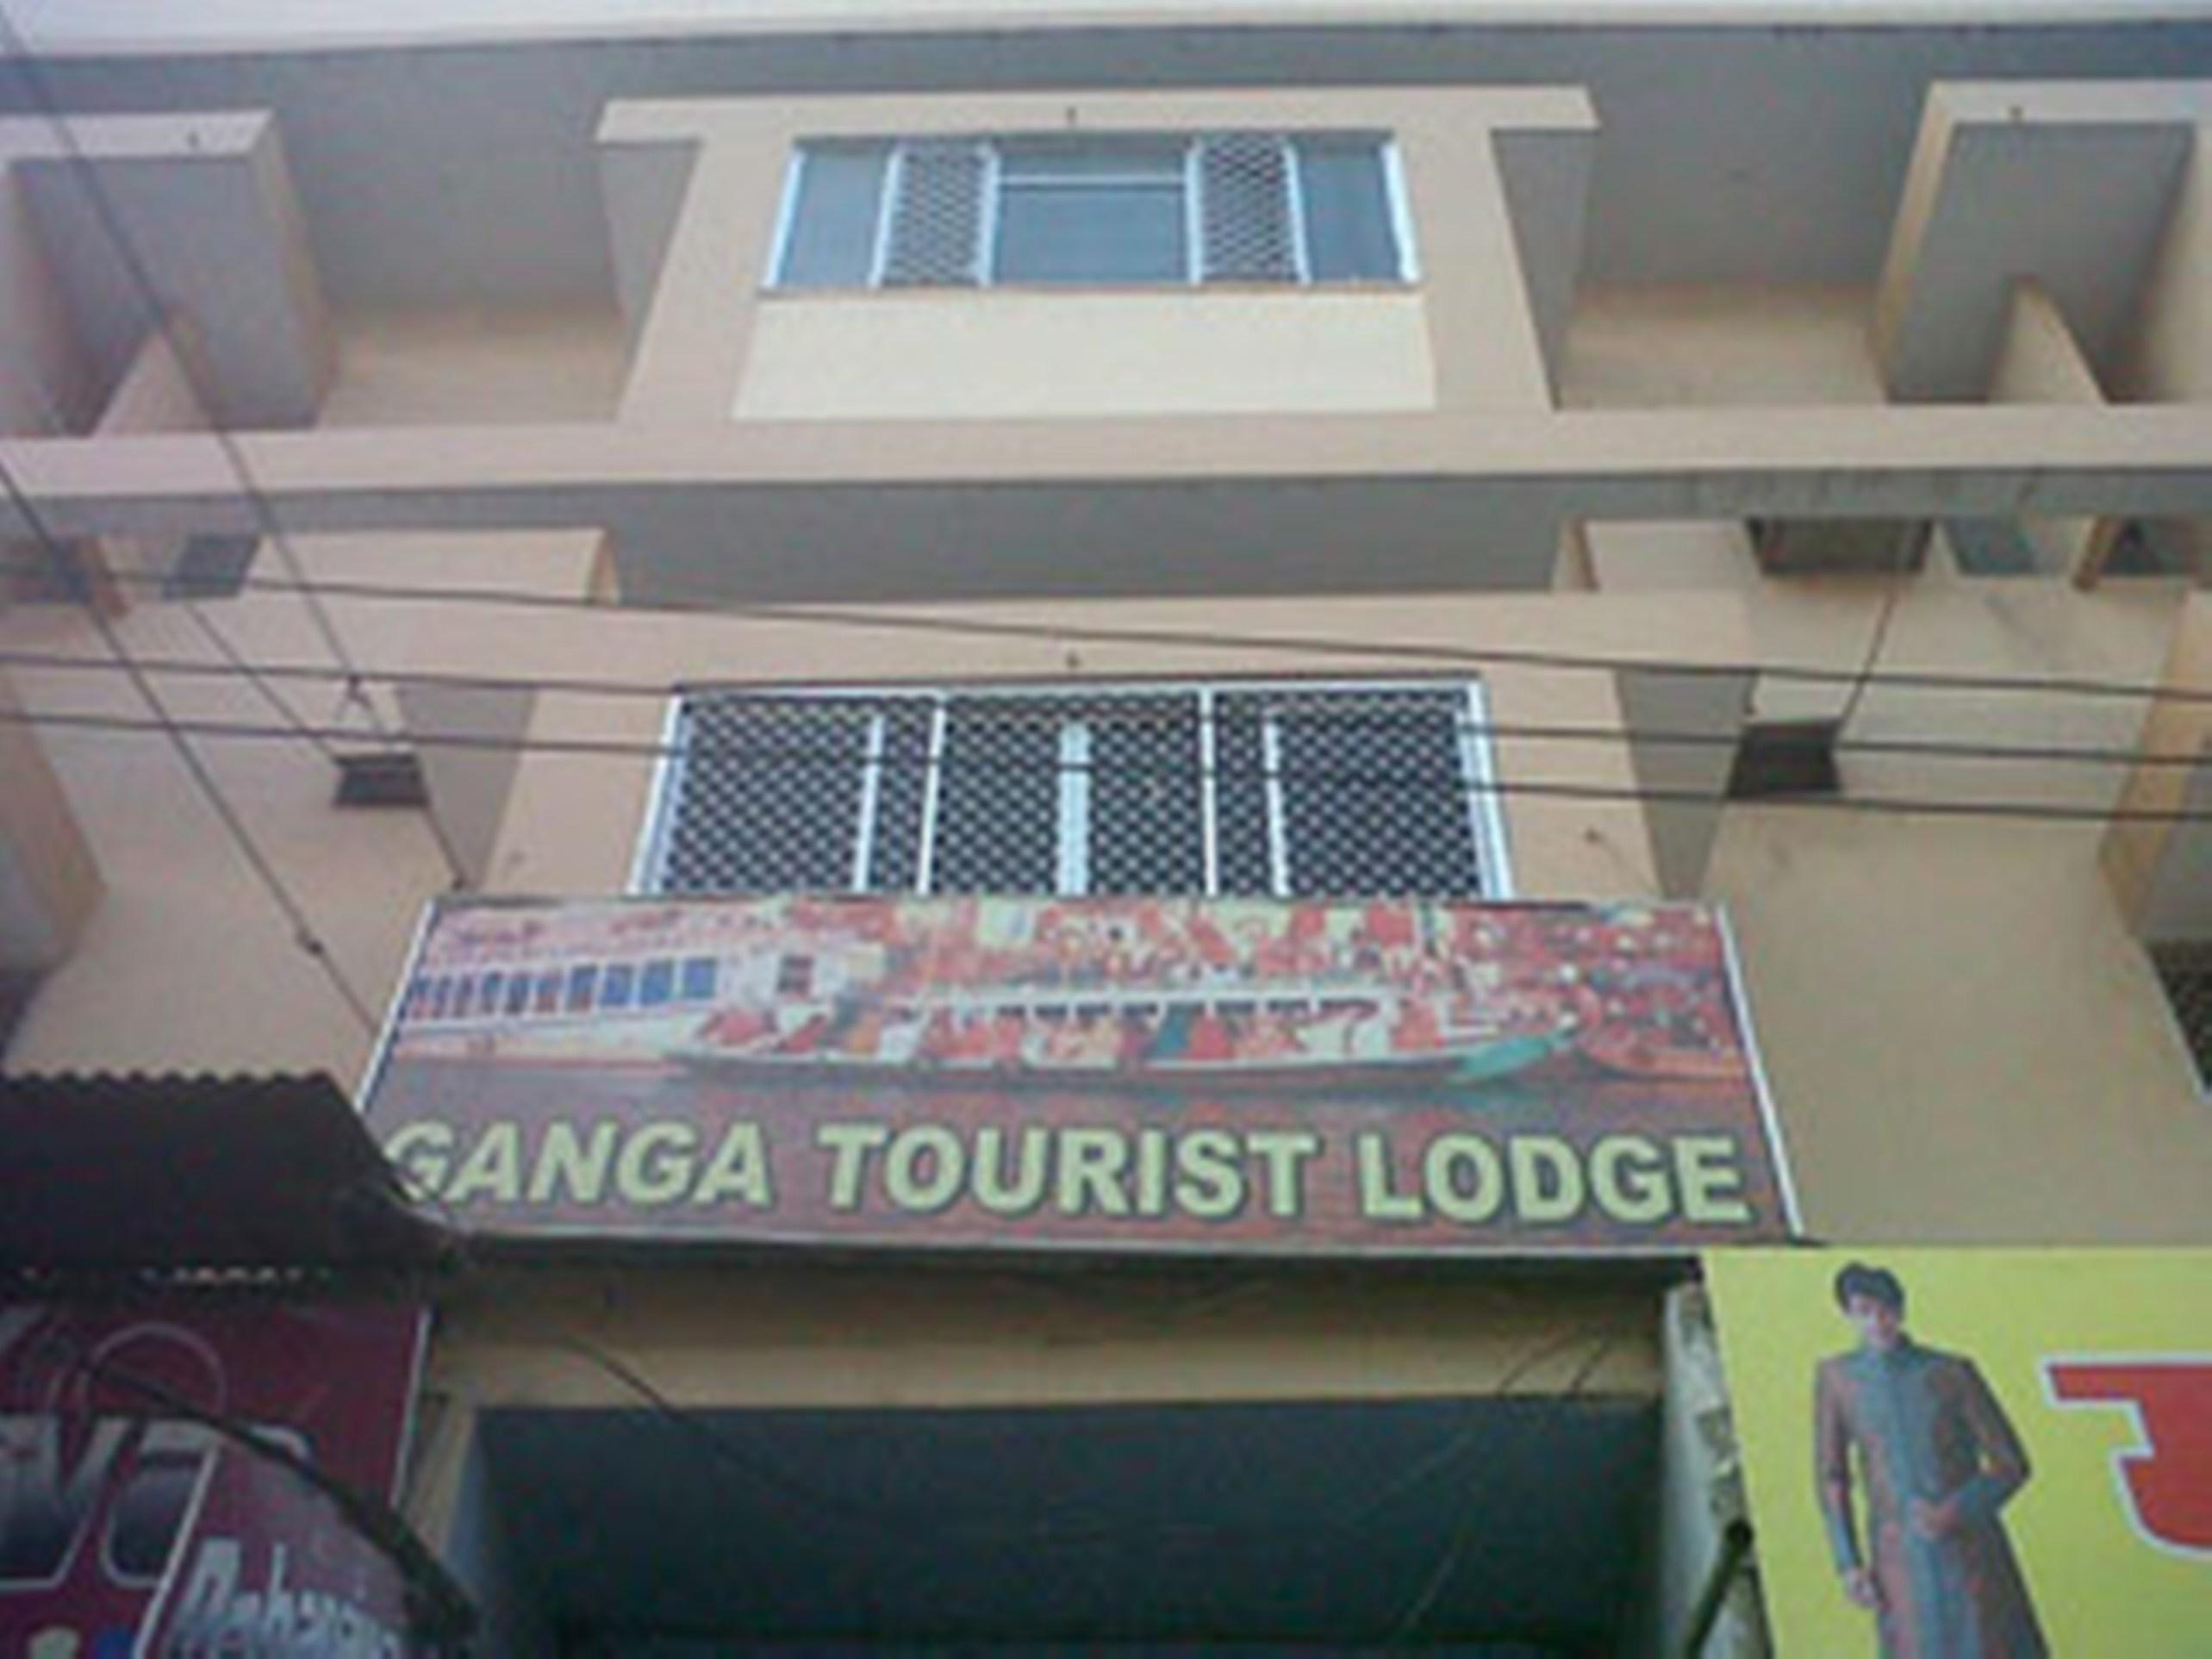 Ganga Tourist Lodge in Varanasi